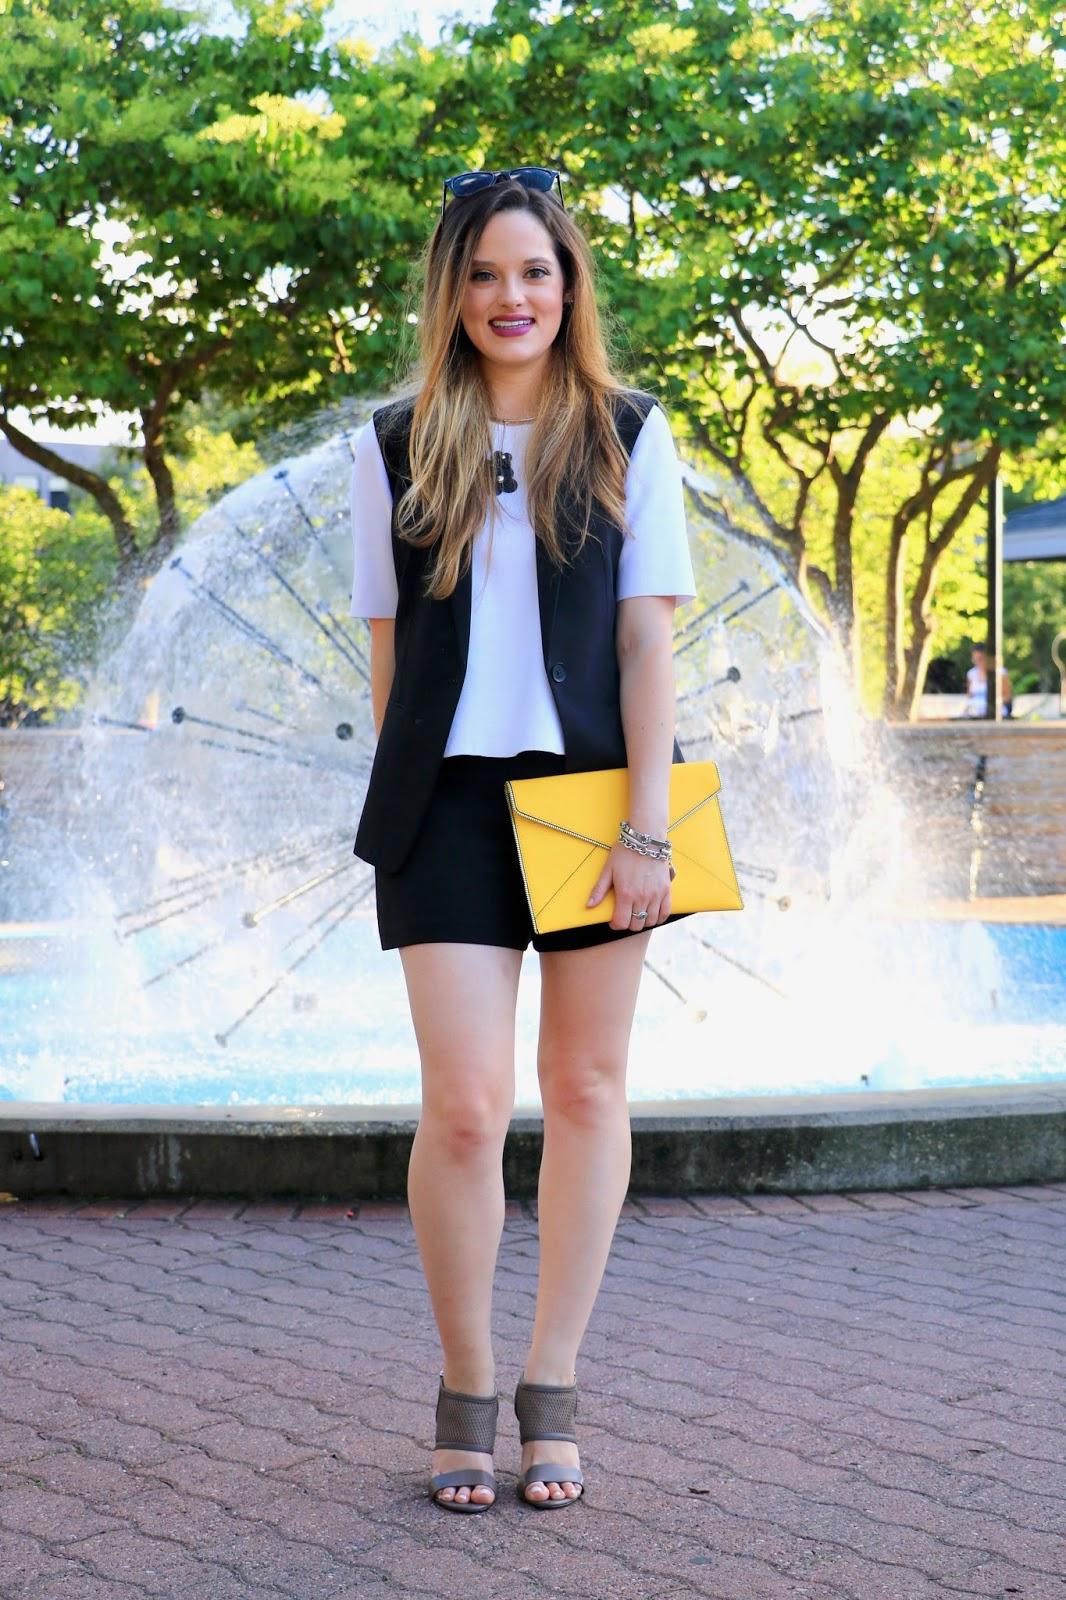 NYC fashion blogger Kathleen Harper of Kat's Fashion Fix wearing shorts